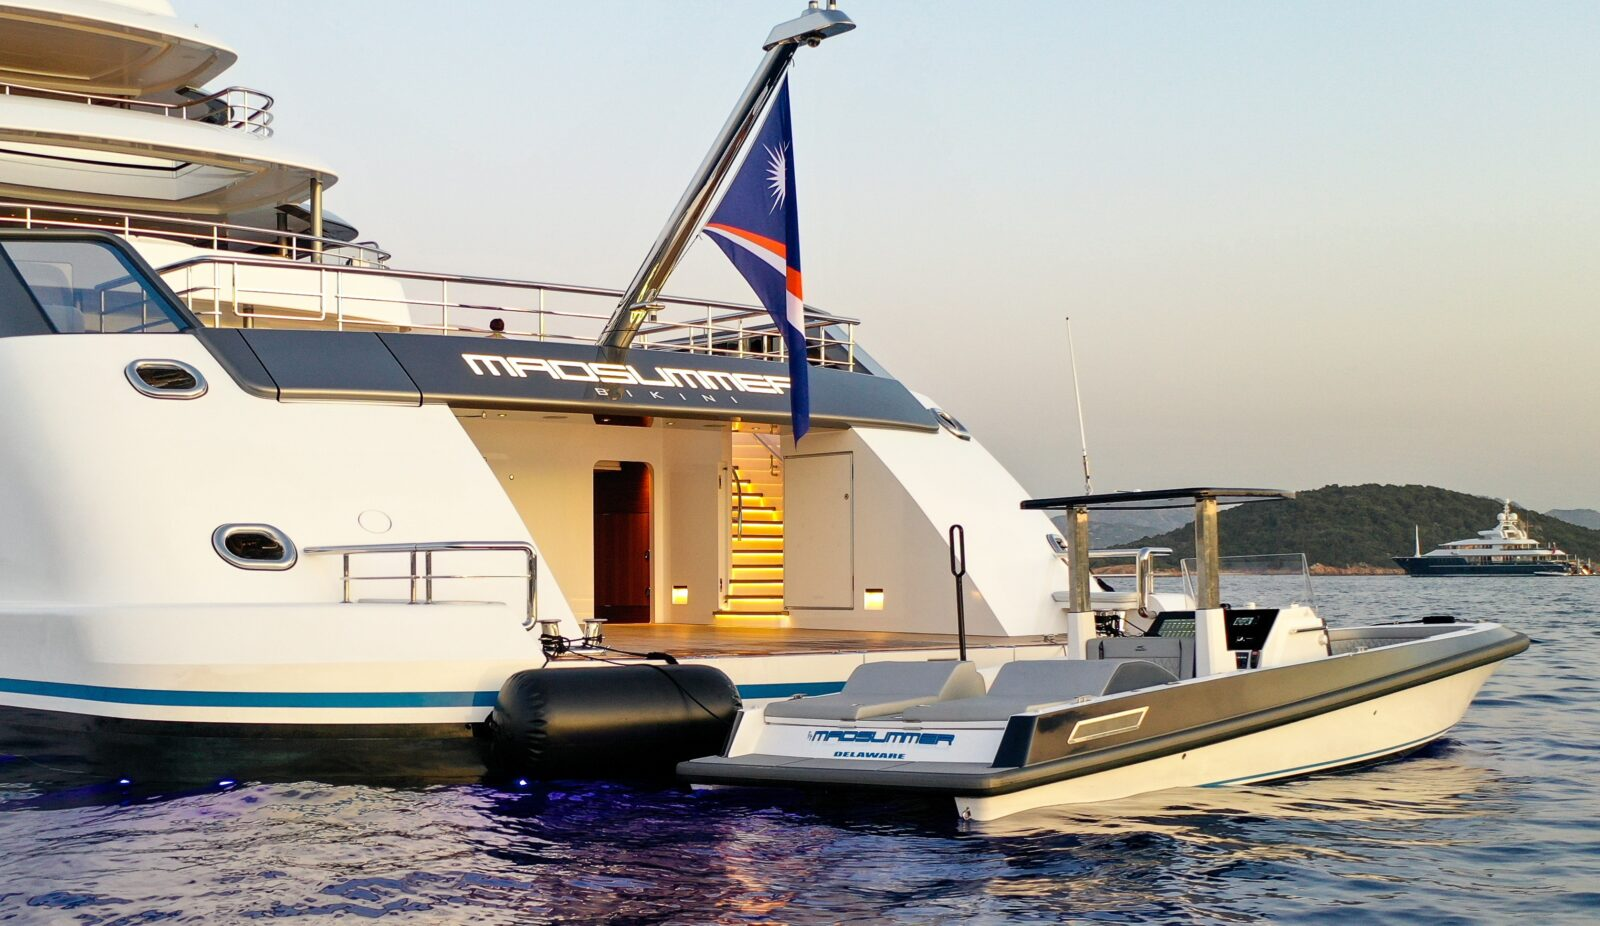 Ocean 1 Yachts Rogue 330 yacht tender Madsummer